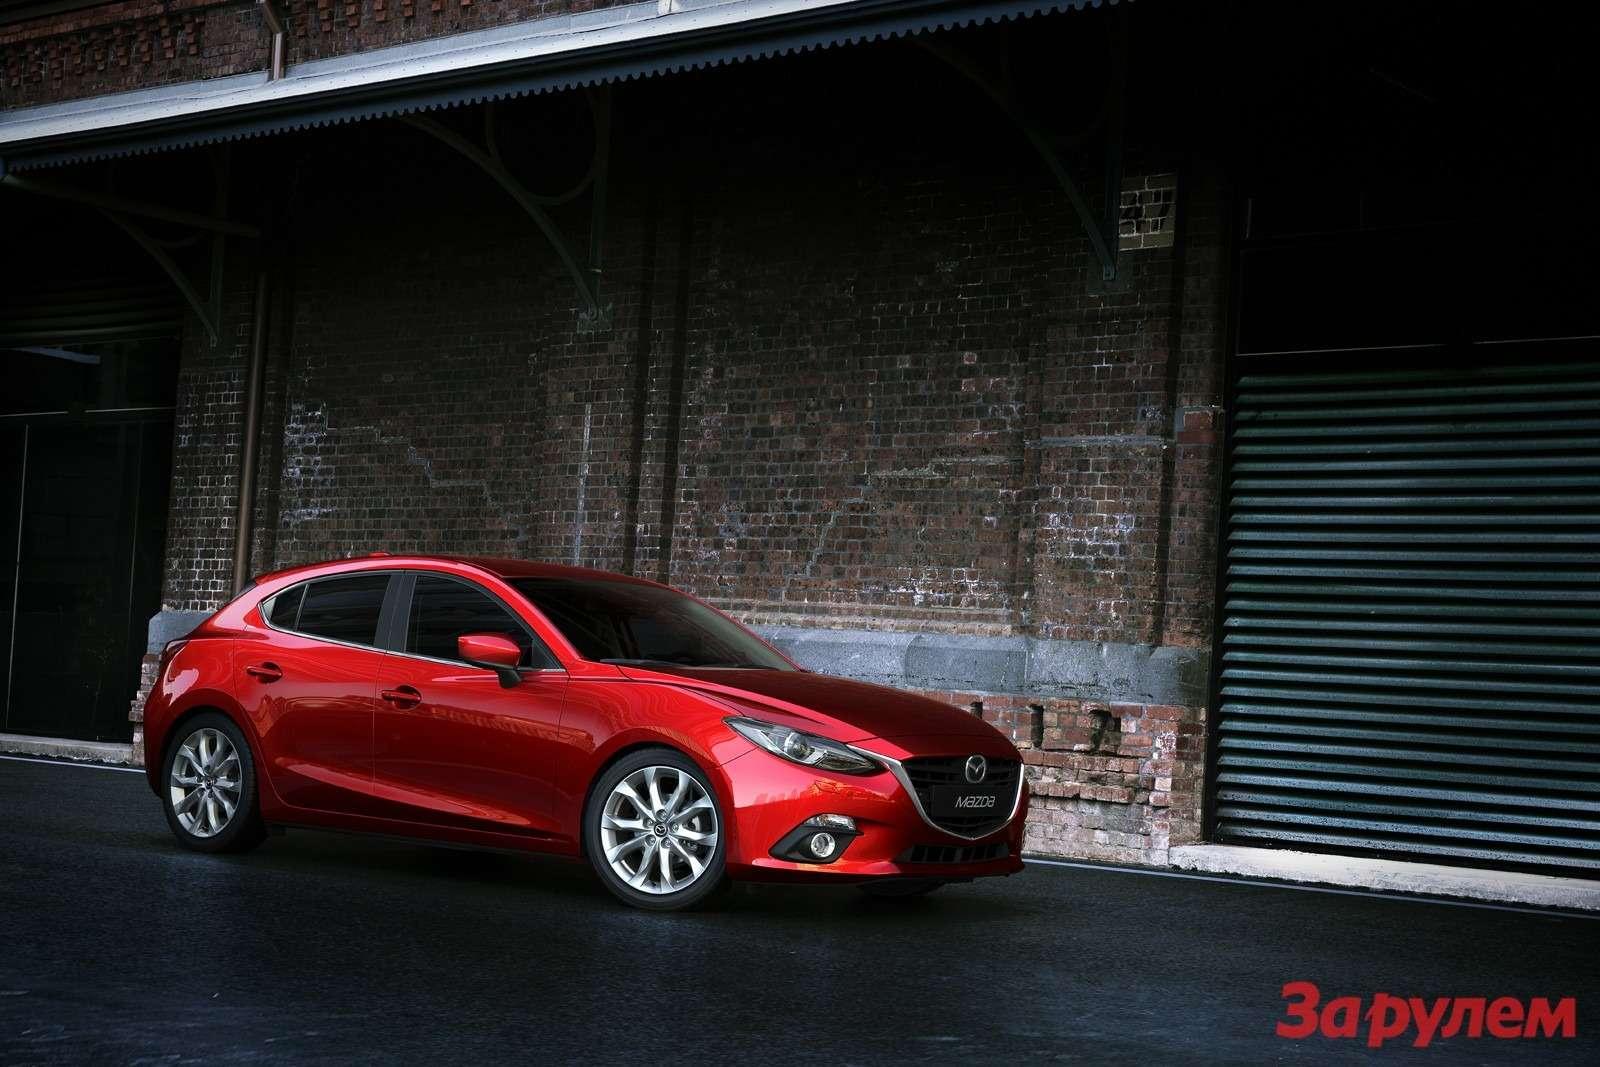 Mazda3 Hatchback 2013 still 02copy